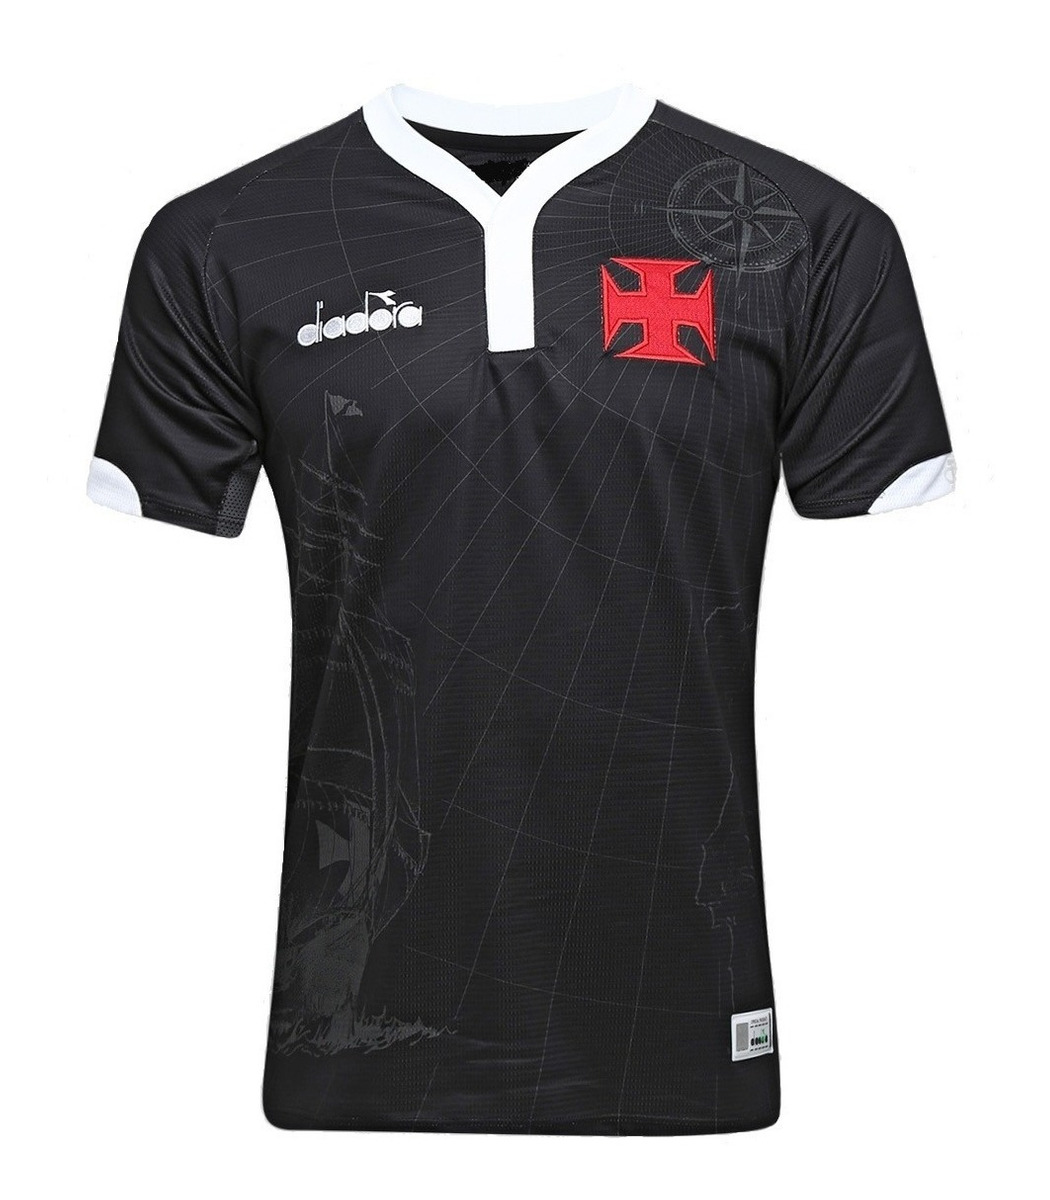 8c52633ce5 Camisa Original Vasco Third ( Uniforme 3) S/n 2019 - R$ 155,00 em ...